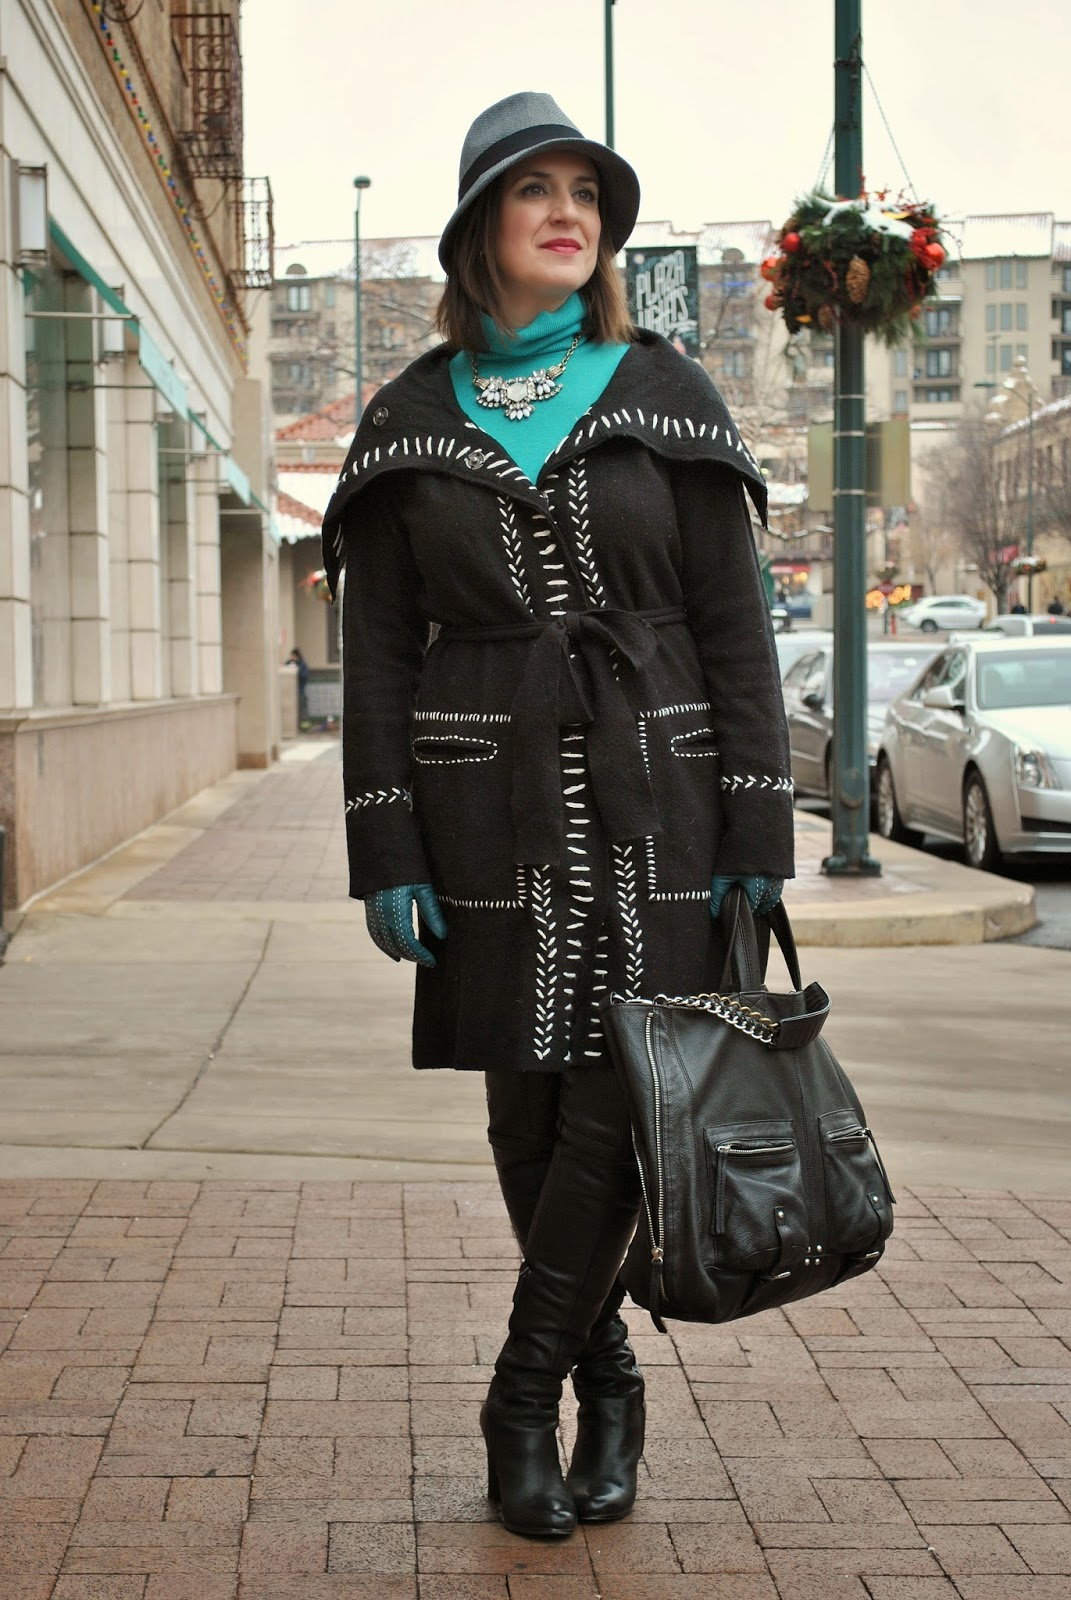 http://akstylemyway.blogspot.com/2014/12/the-coat-alternative.html